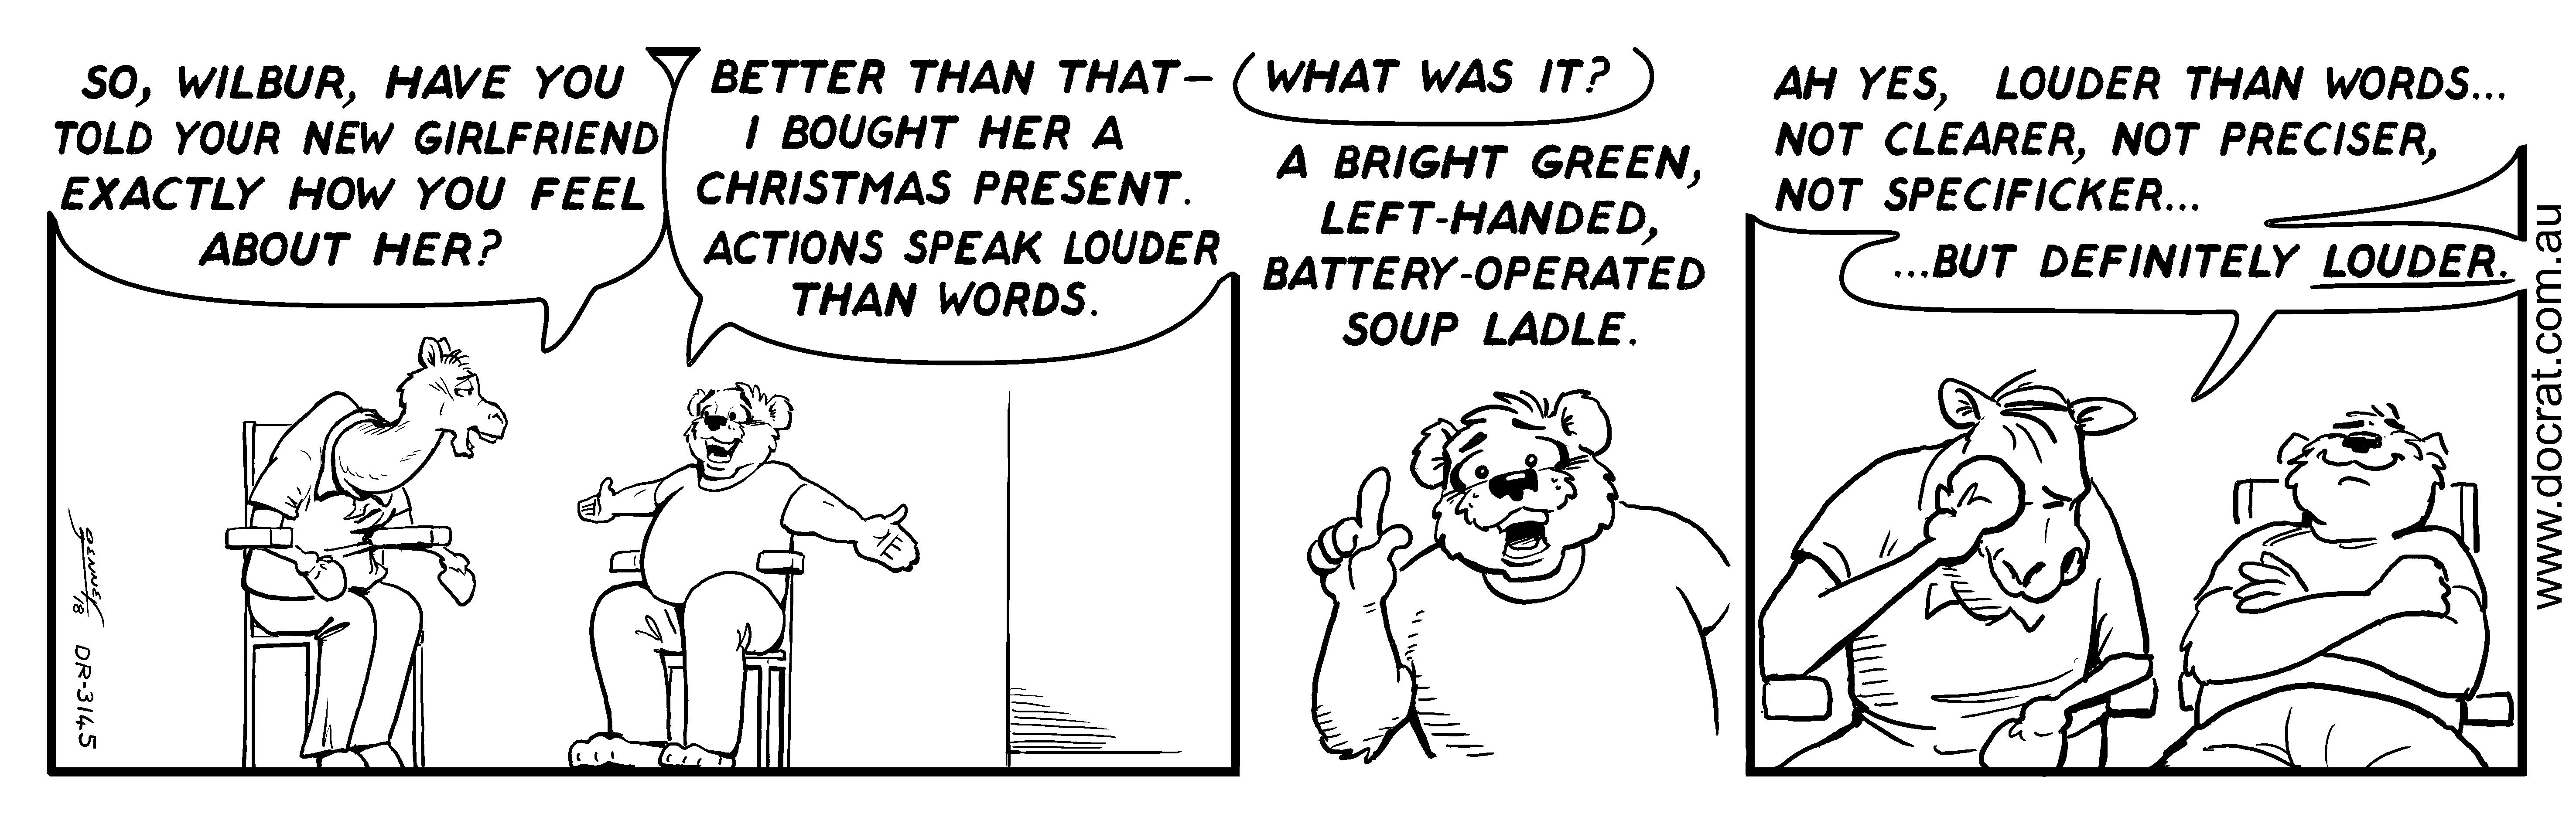 20181228